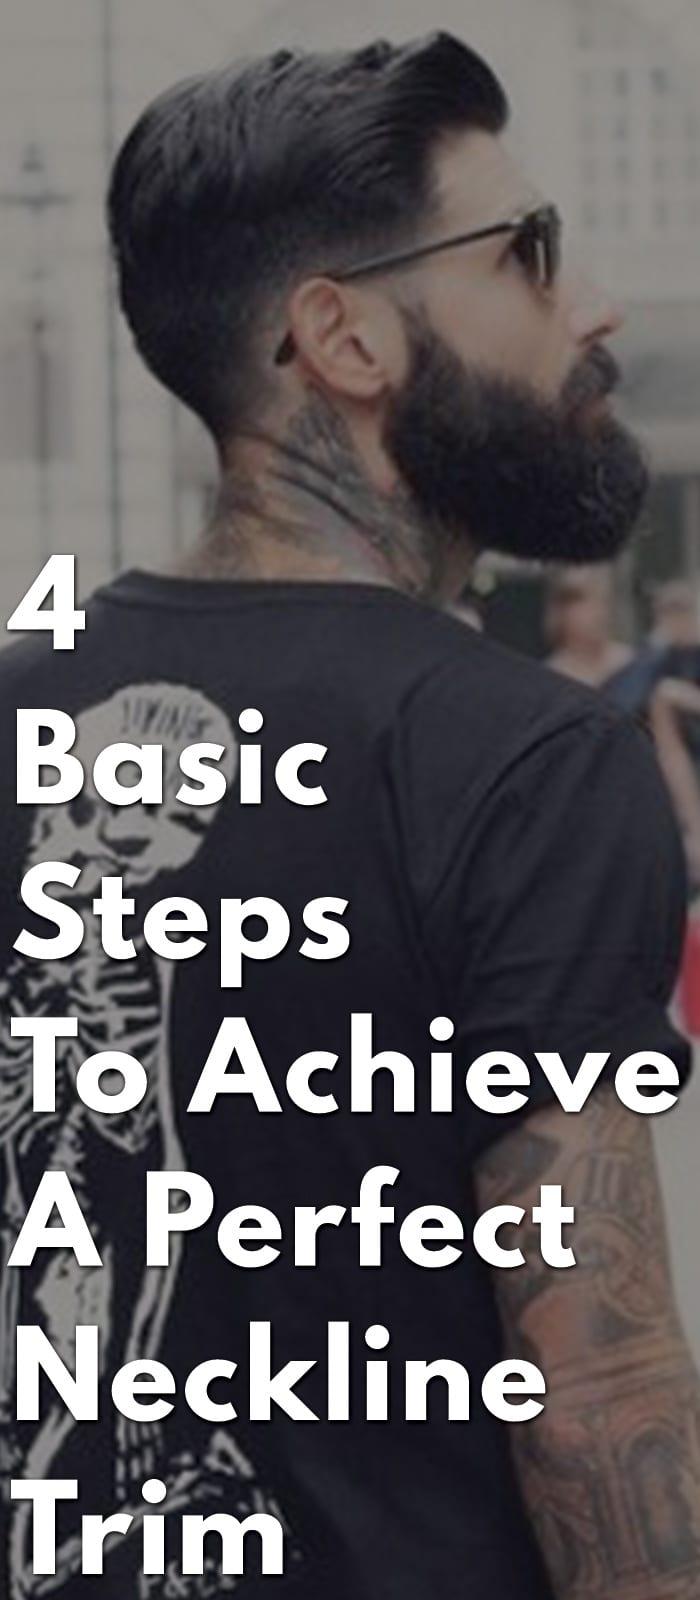 4-Basic-Steps-To-Achieve-A-Perfect-Neckline-Trim